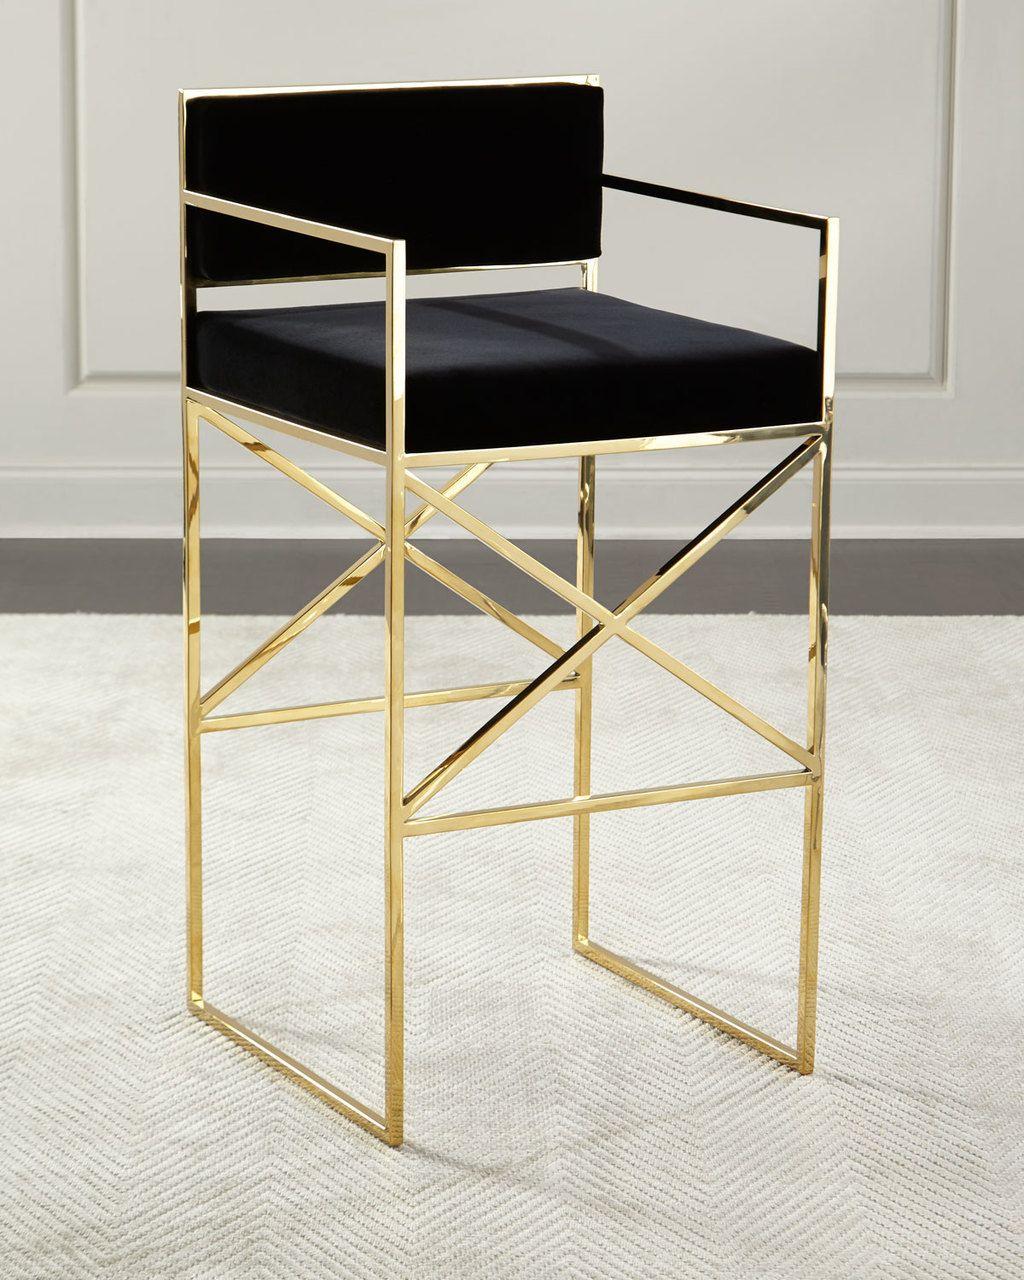 Fine Safavieh Kailey Velvet Bar Stool Black Gold 750 Free Unemploymentrelief Wooden Chair Designs For Living Room Unemploymentrelieforg